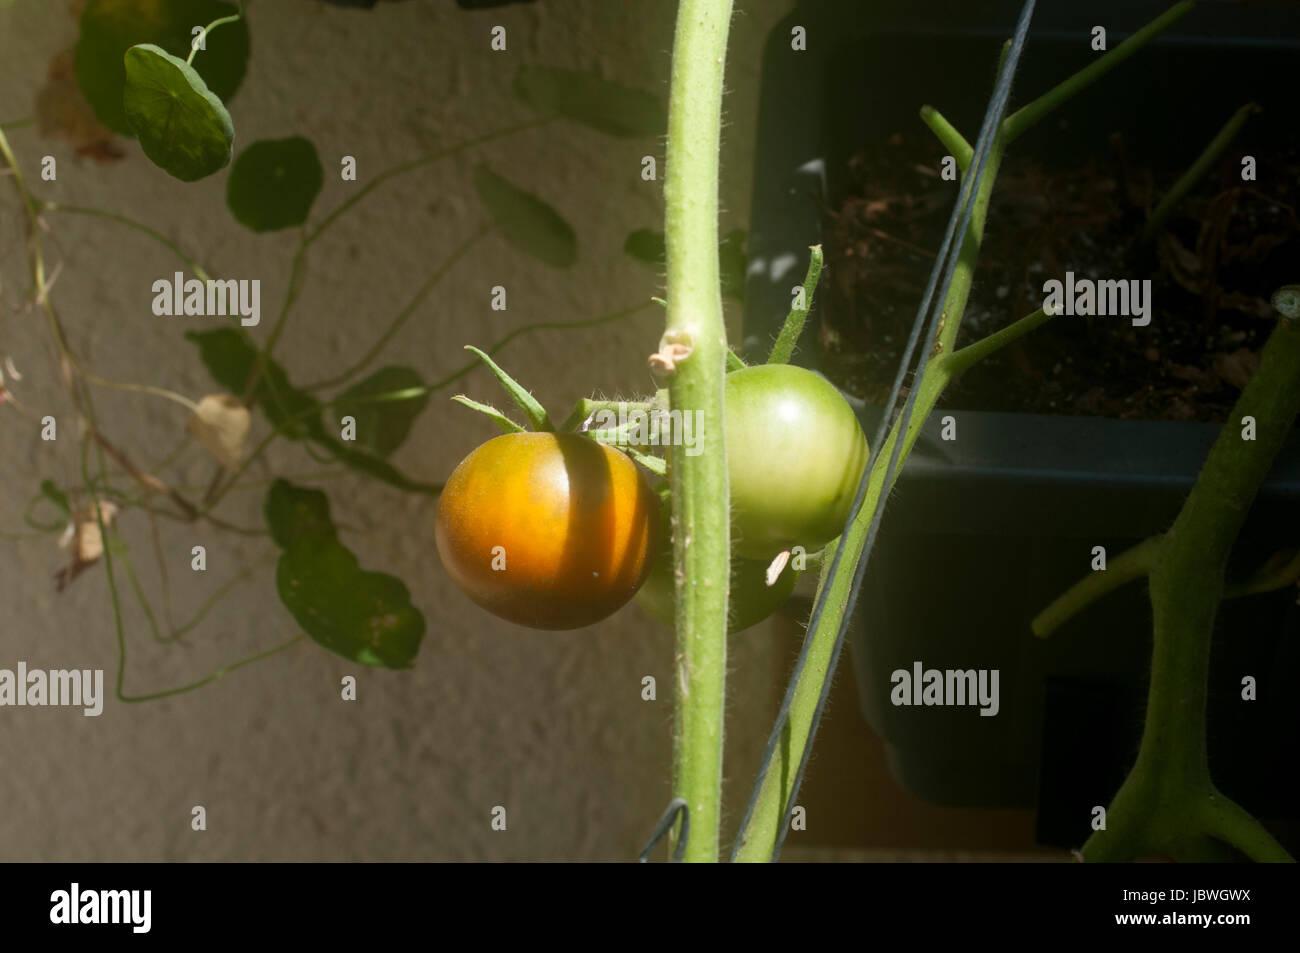 Tomato ripens on a bush in an urban community garden. Self grown ...